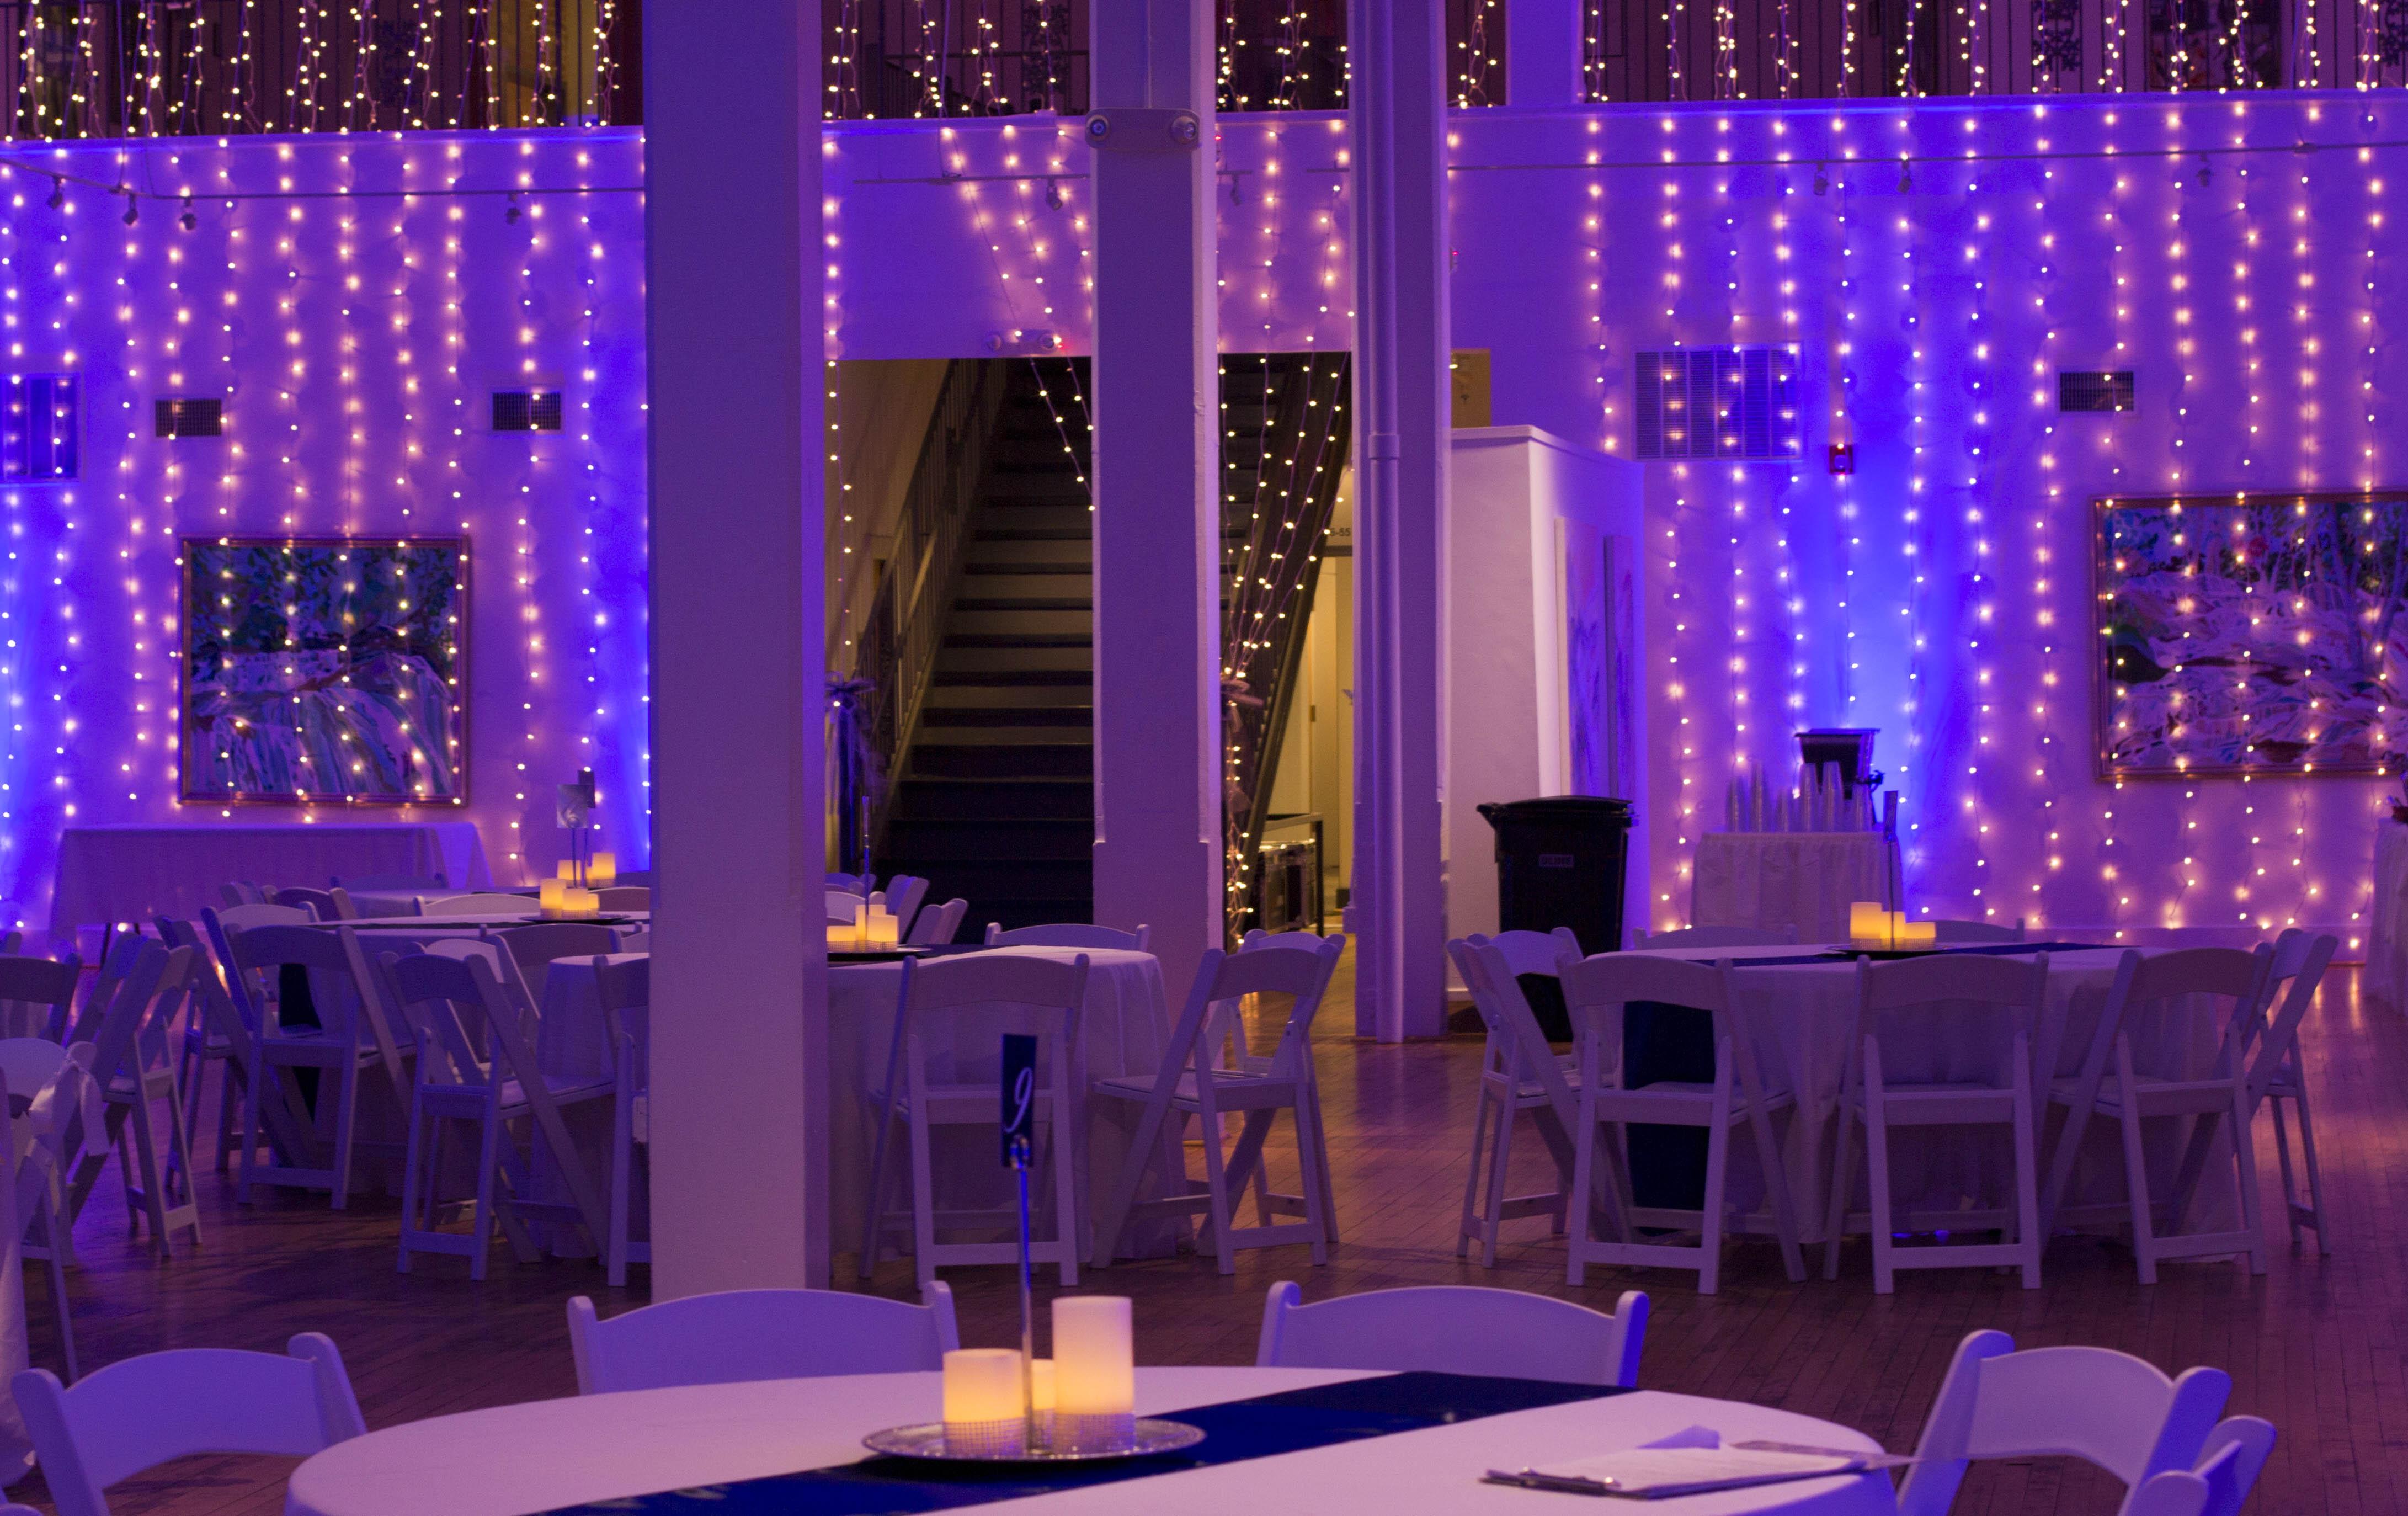 Wedding and event uplighting ward center pertersburg virginia